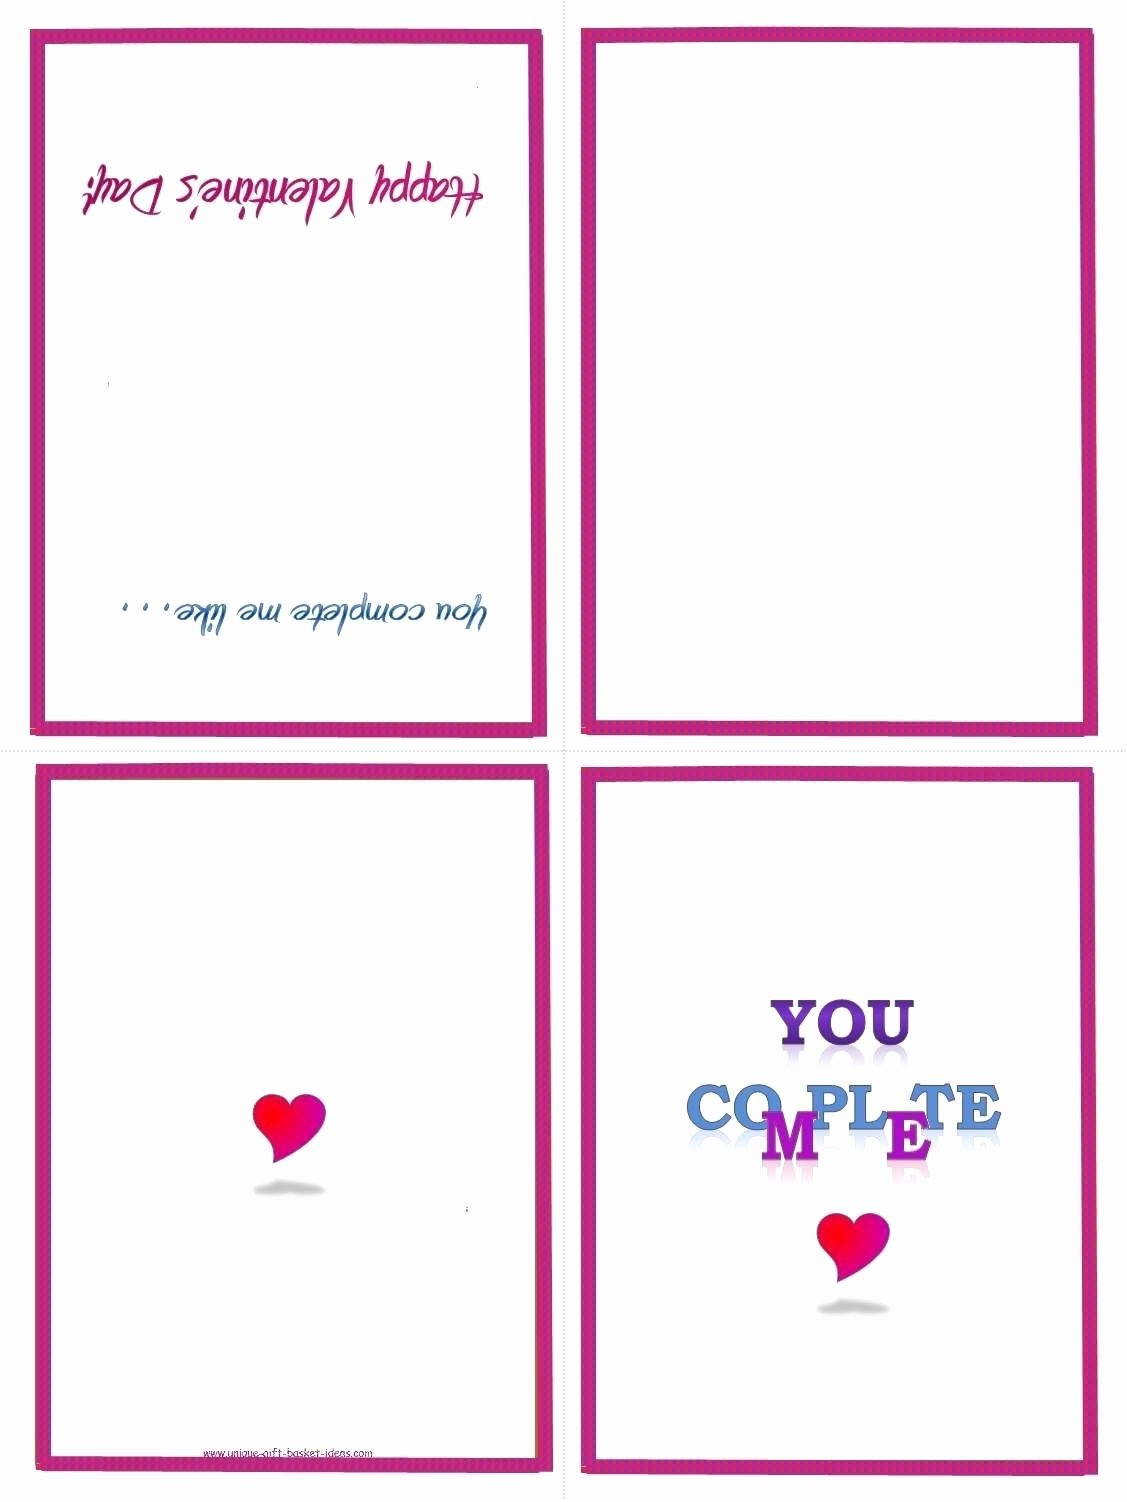 Folding Business Cards Template Fresh Printable Folding Card Template